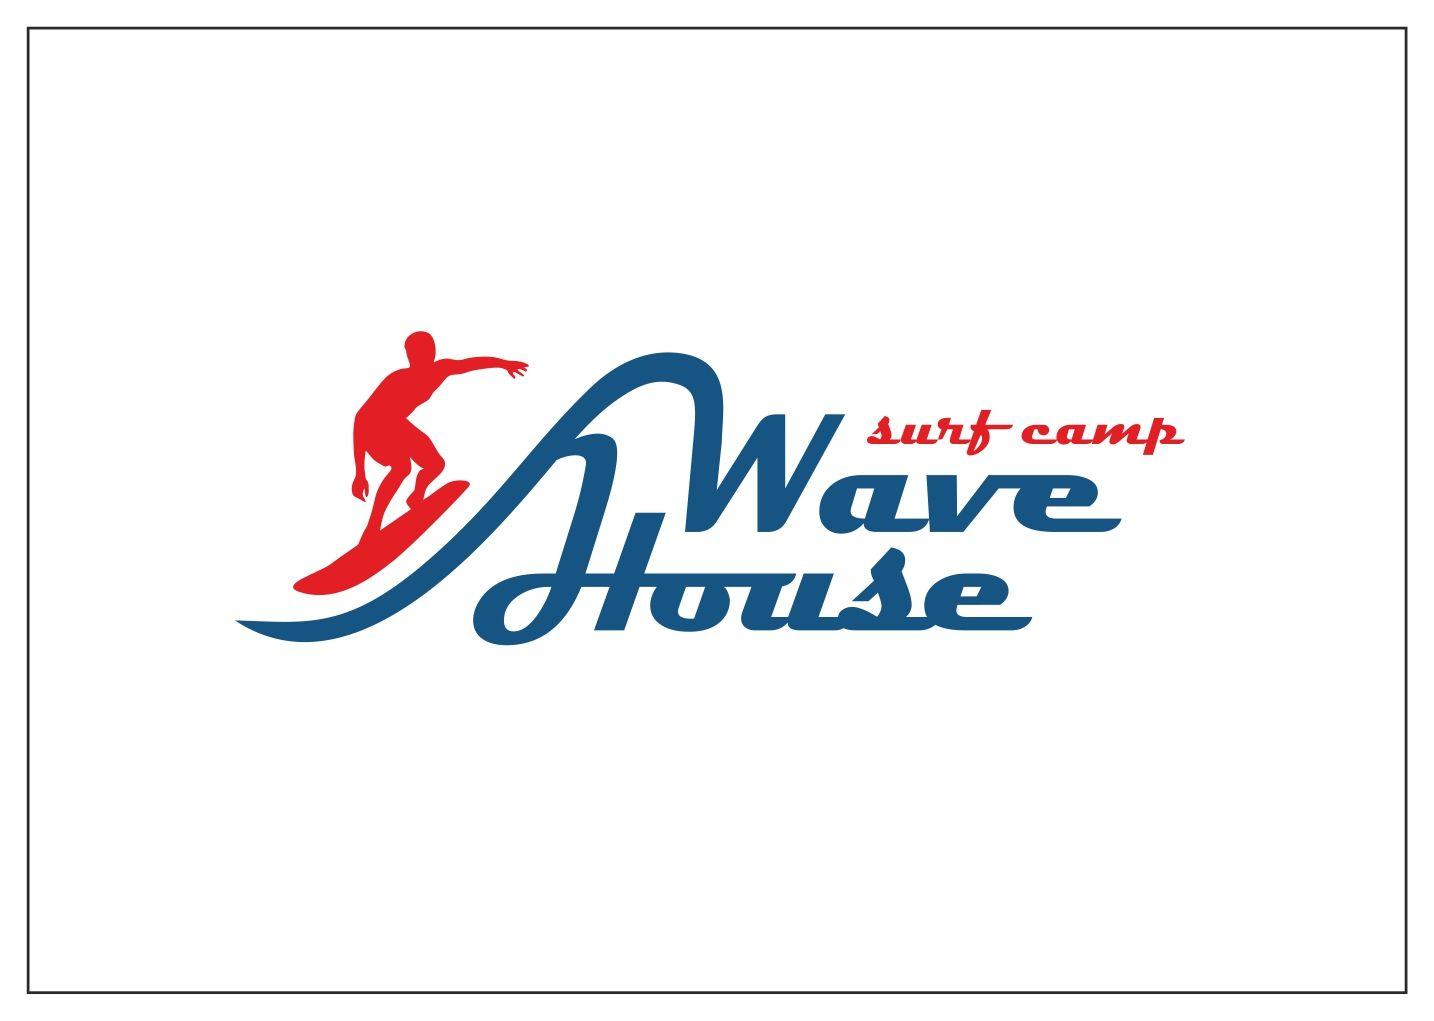 Редизайн логотипа для серф-кэмпа на Бали - дизайнер zooosad